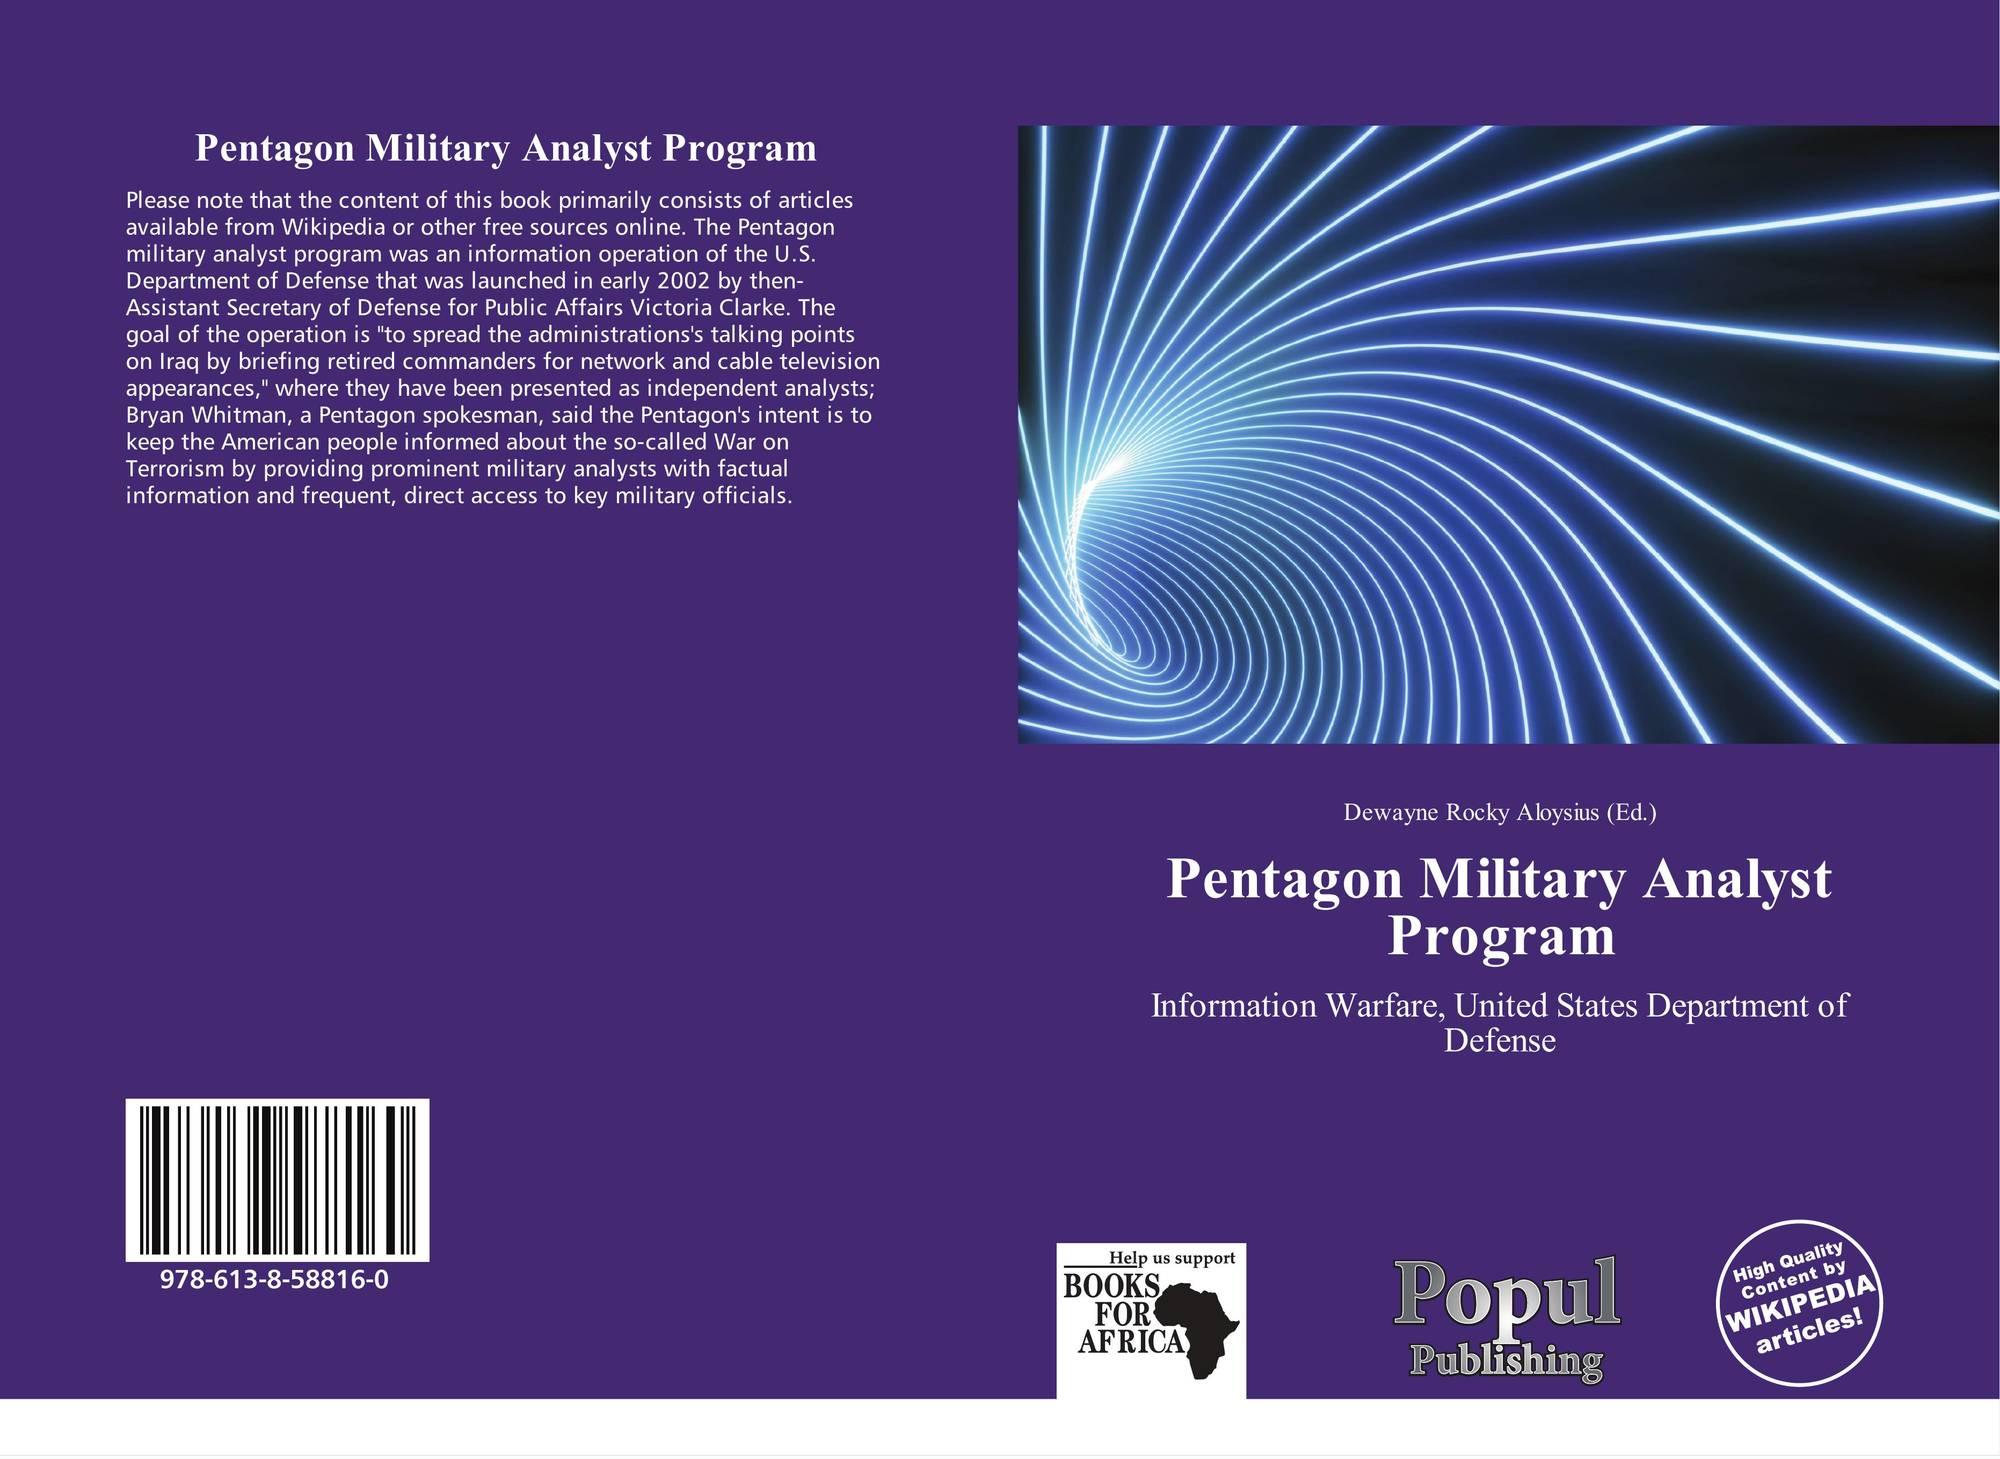 Pentagon Military Analyst Program, 978-613-8-58816-0, 6138588169 ...